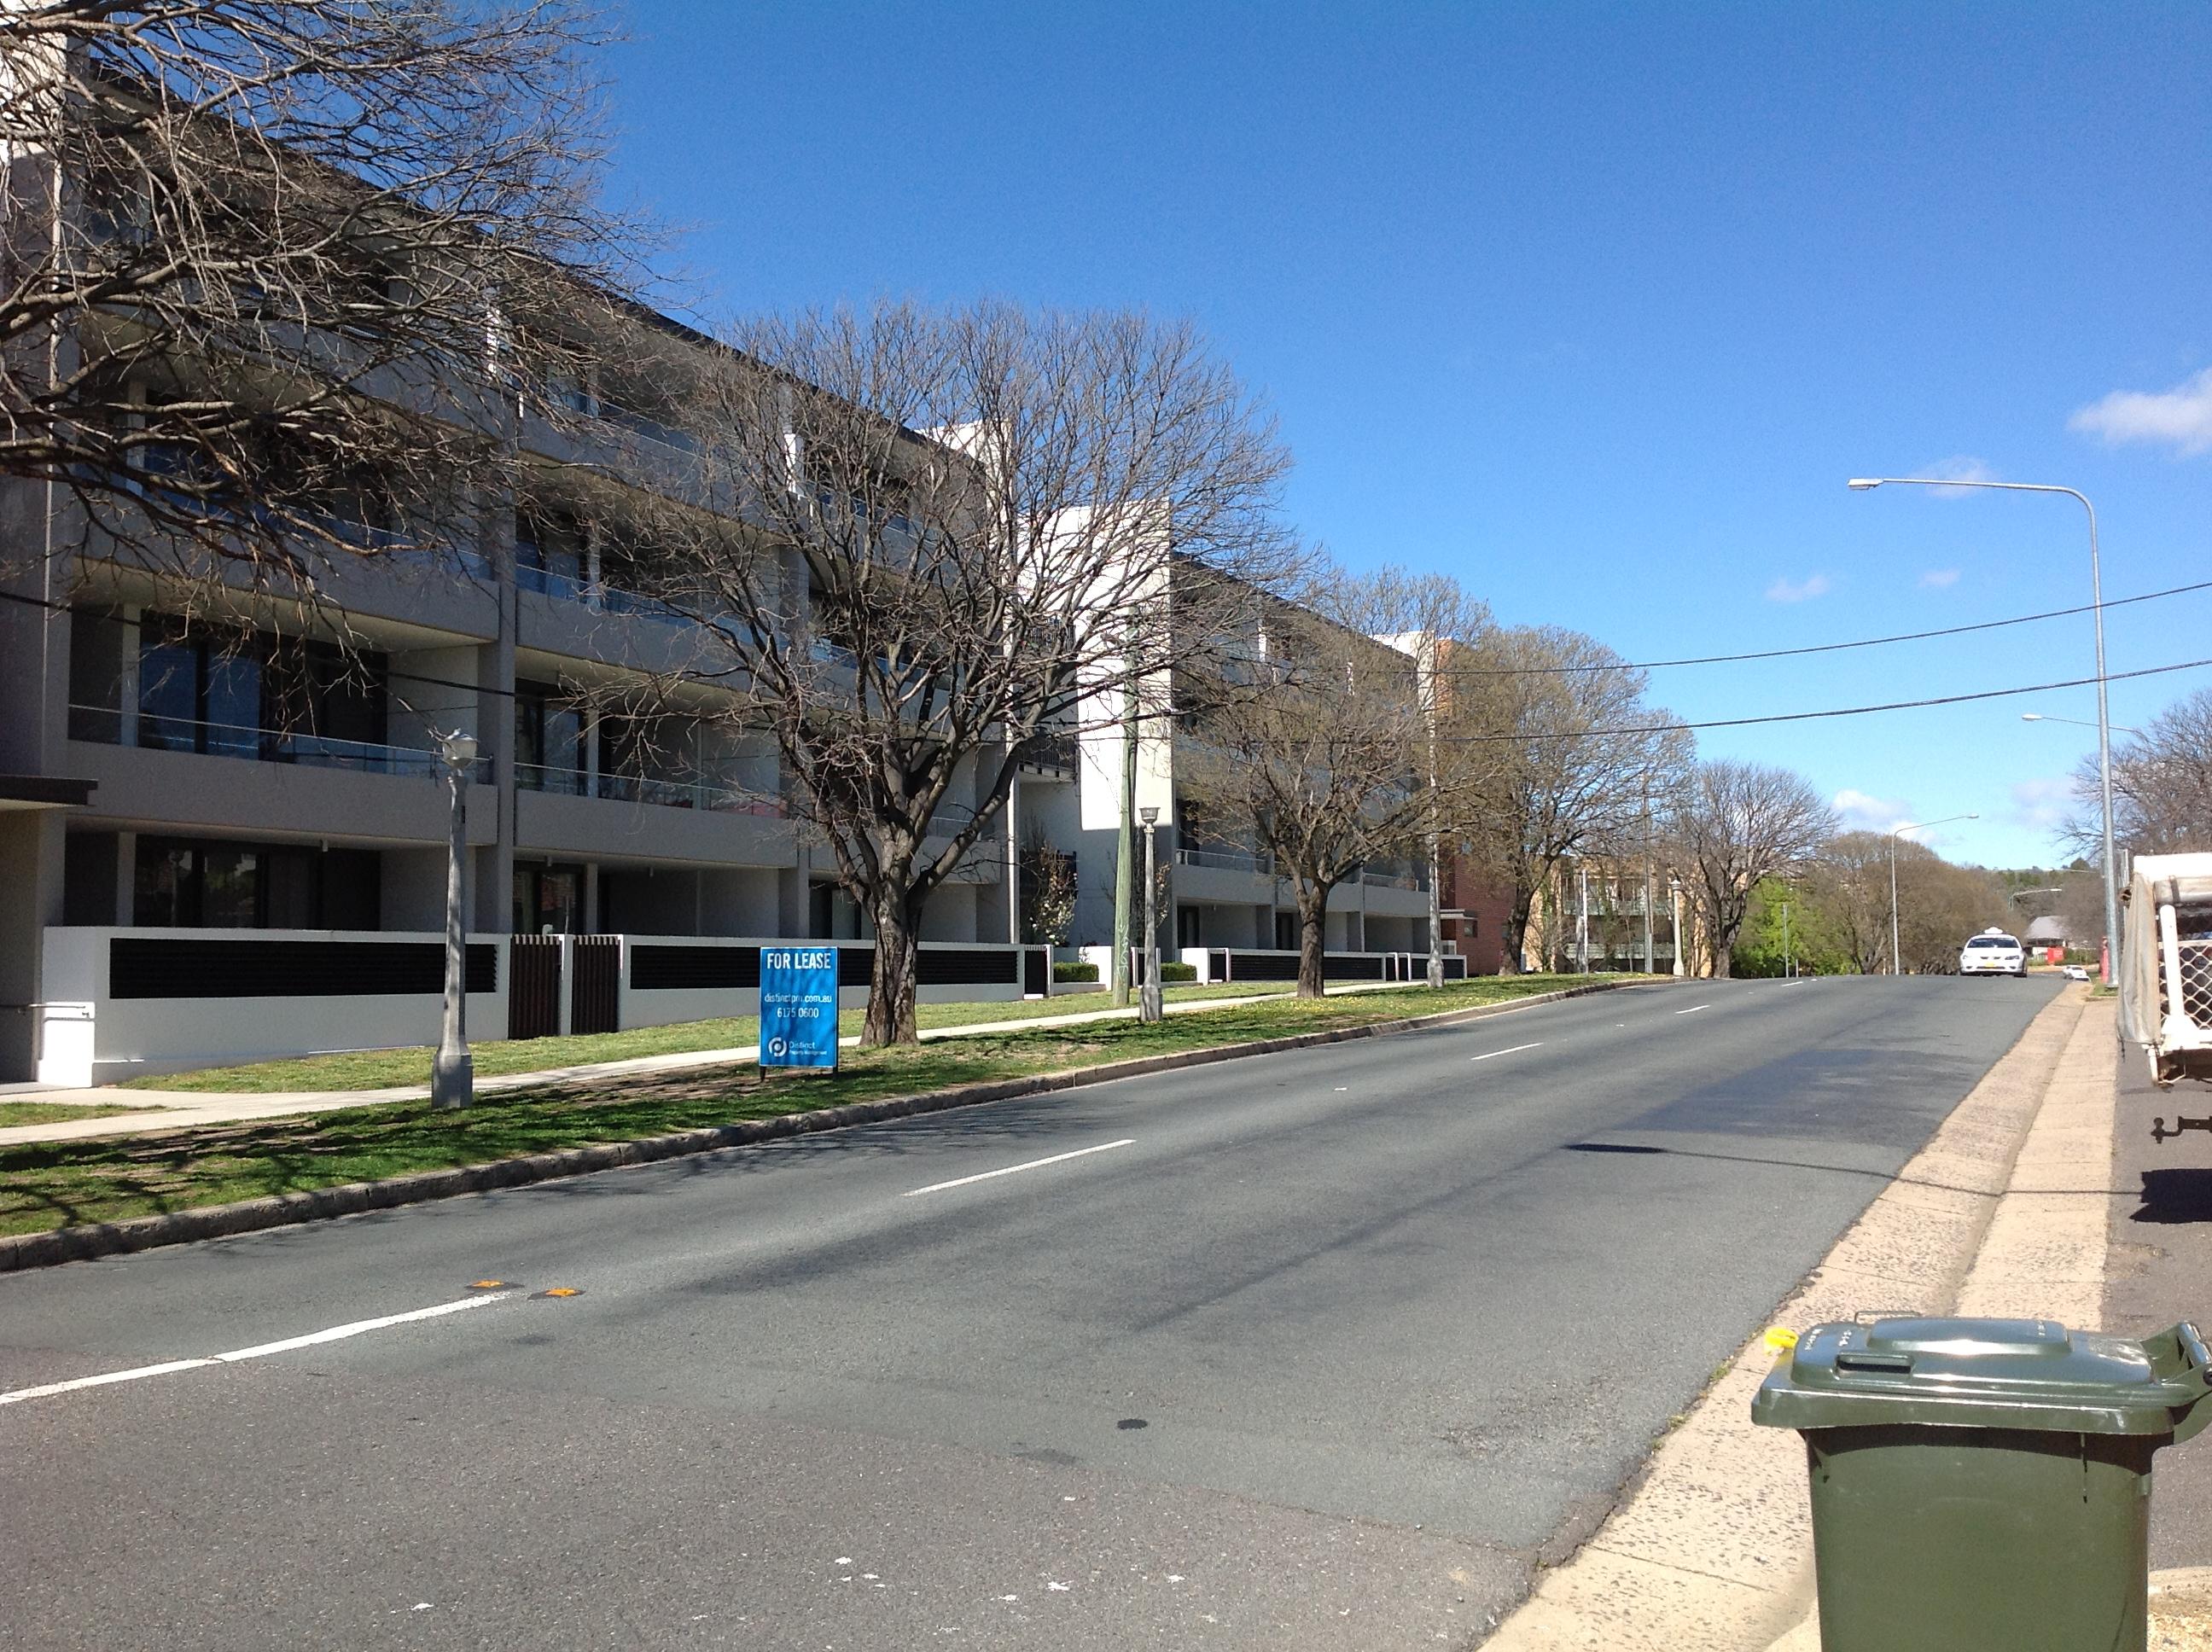 Picture of bland medium density development and street